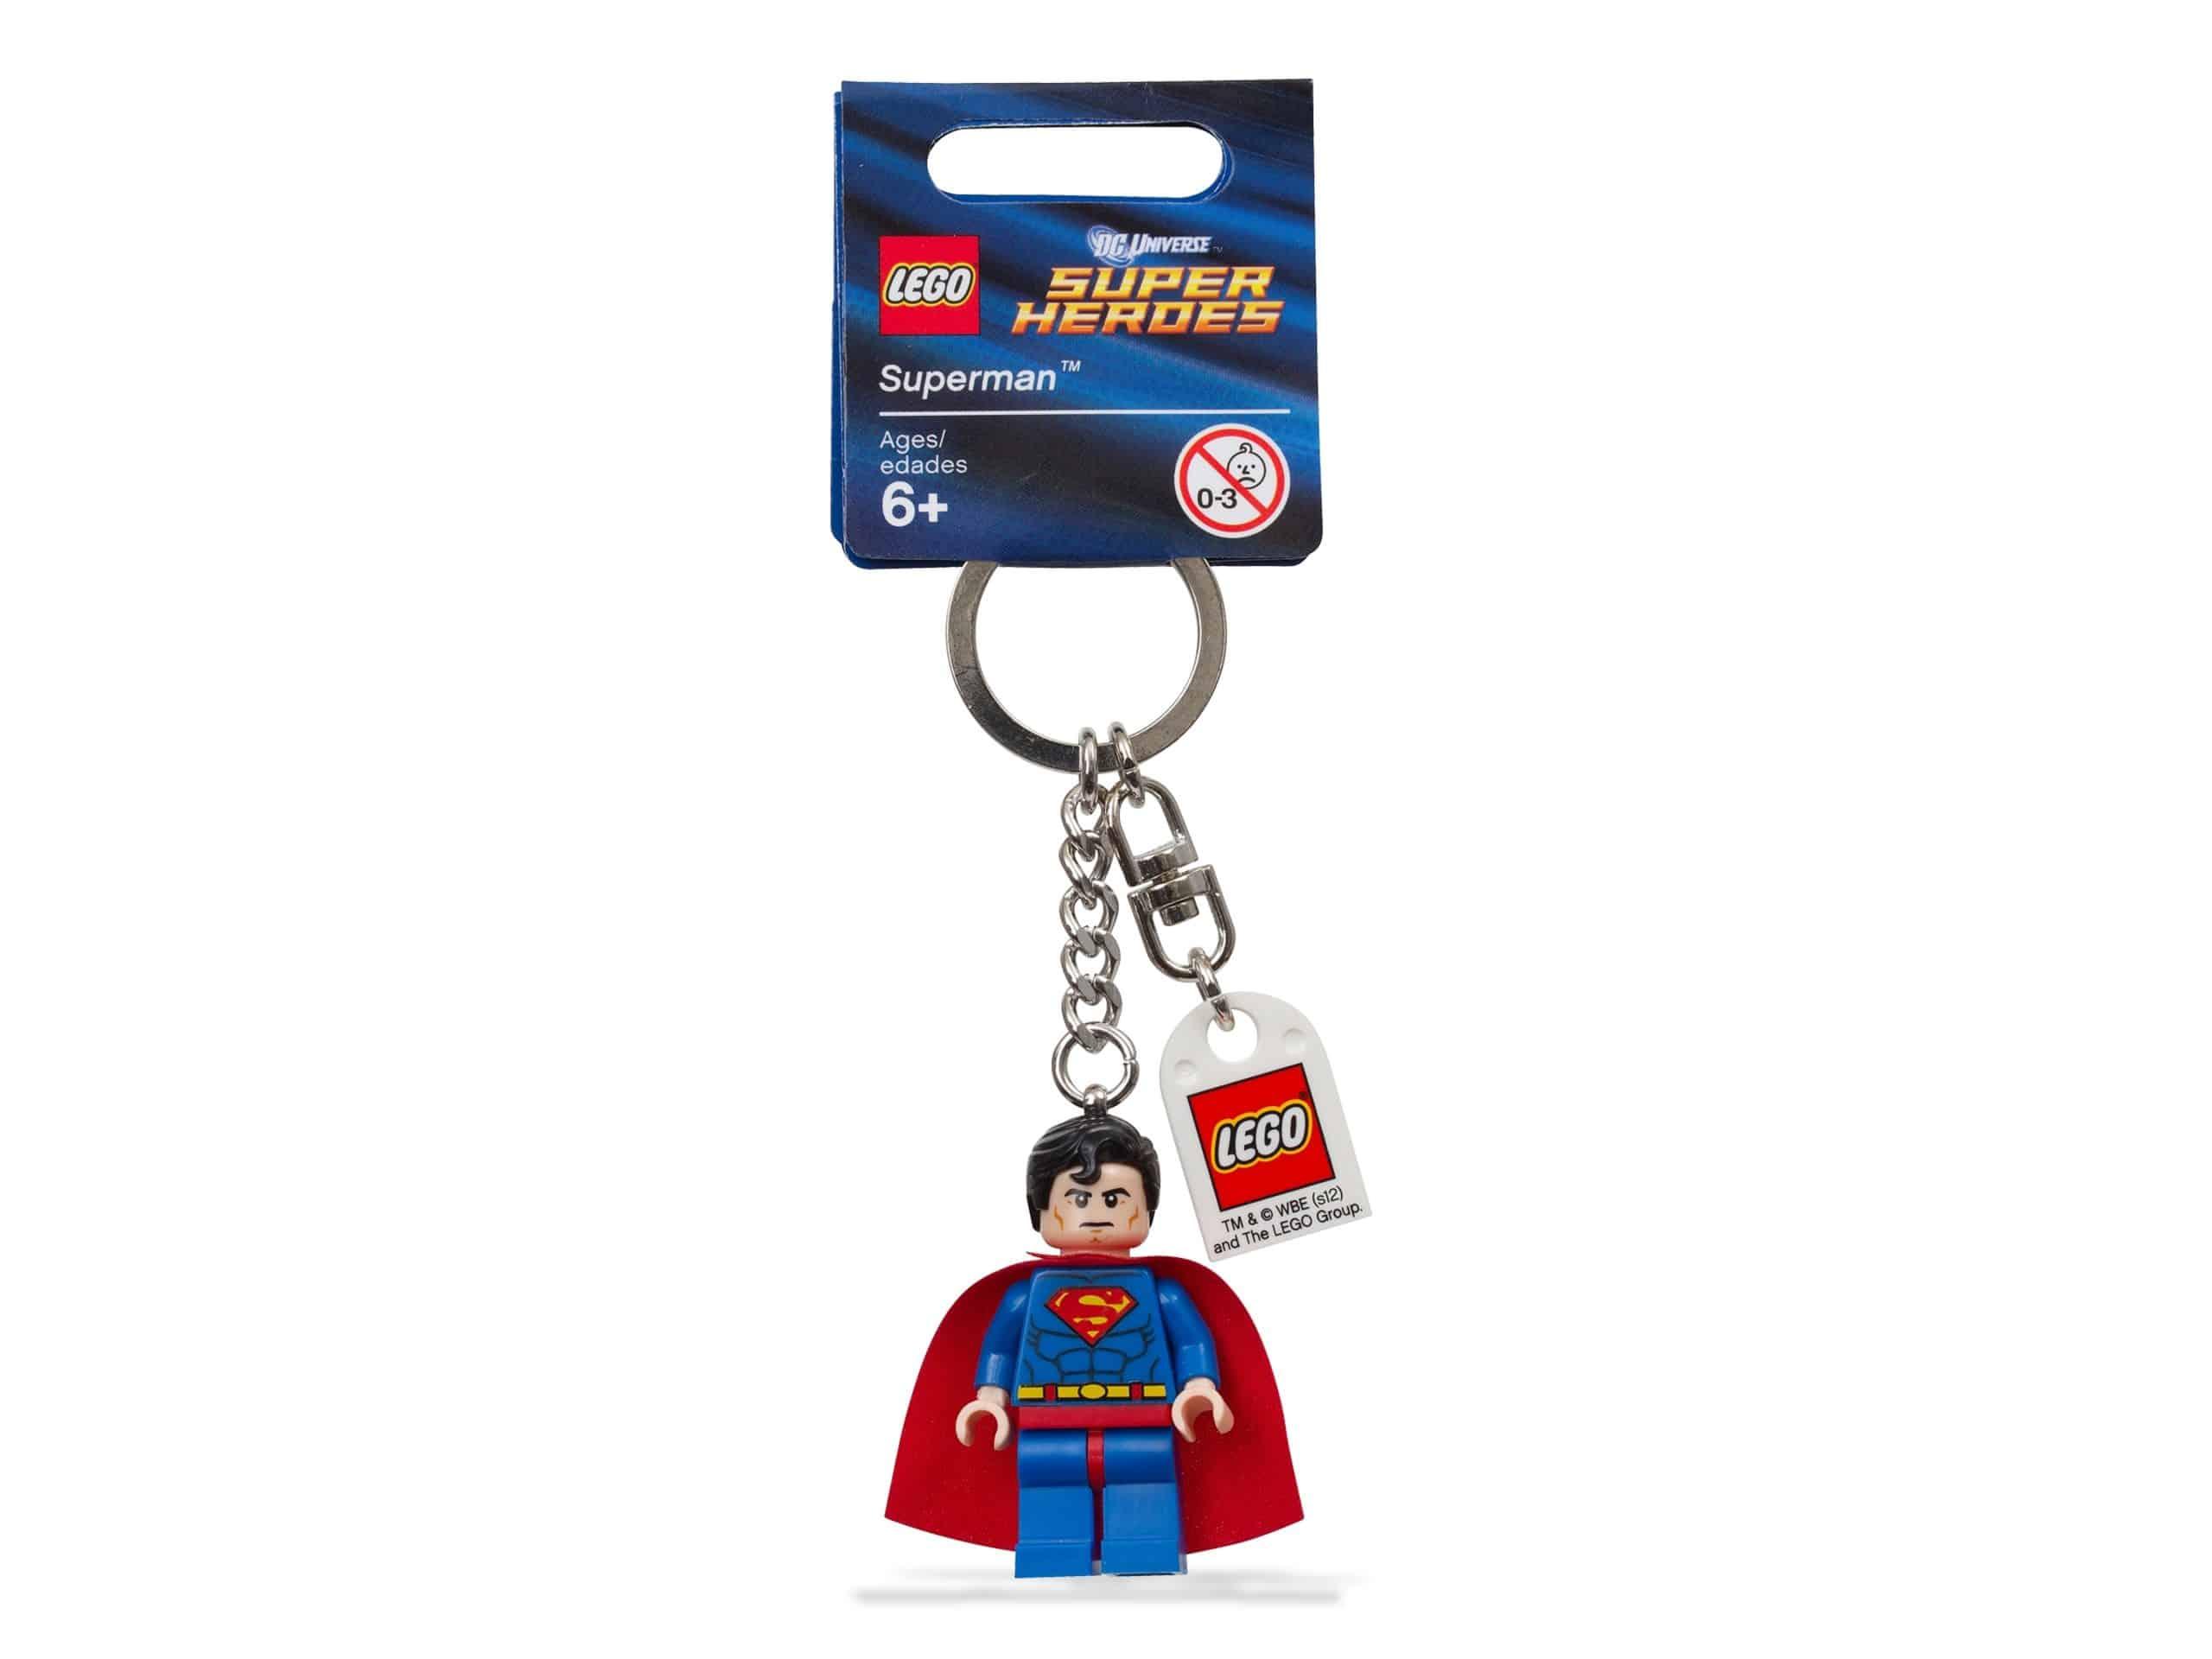 853430 official lego 853430 shop se scaled